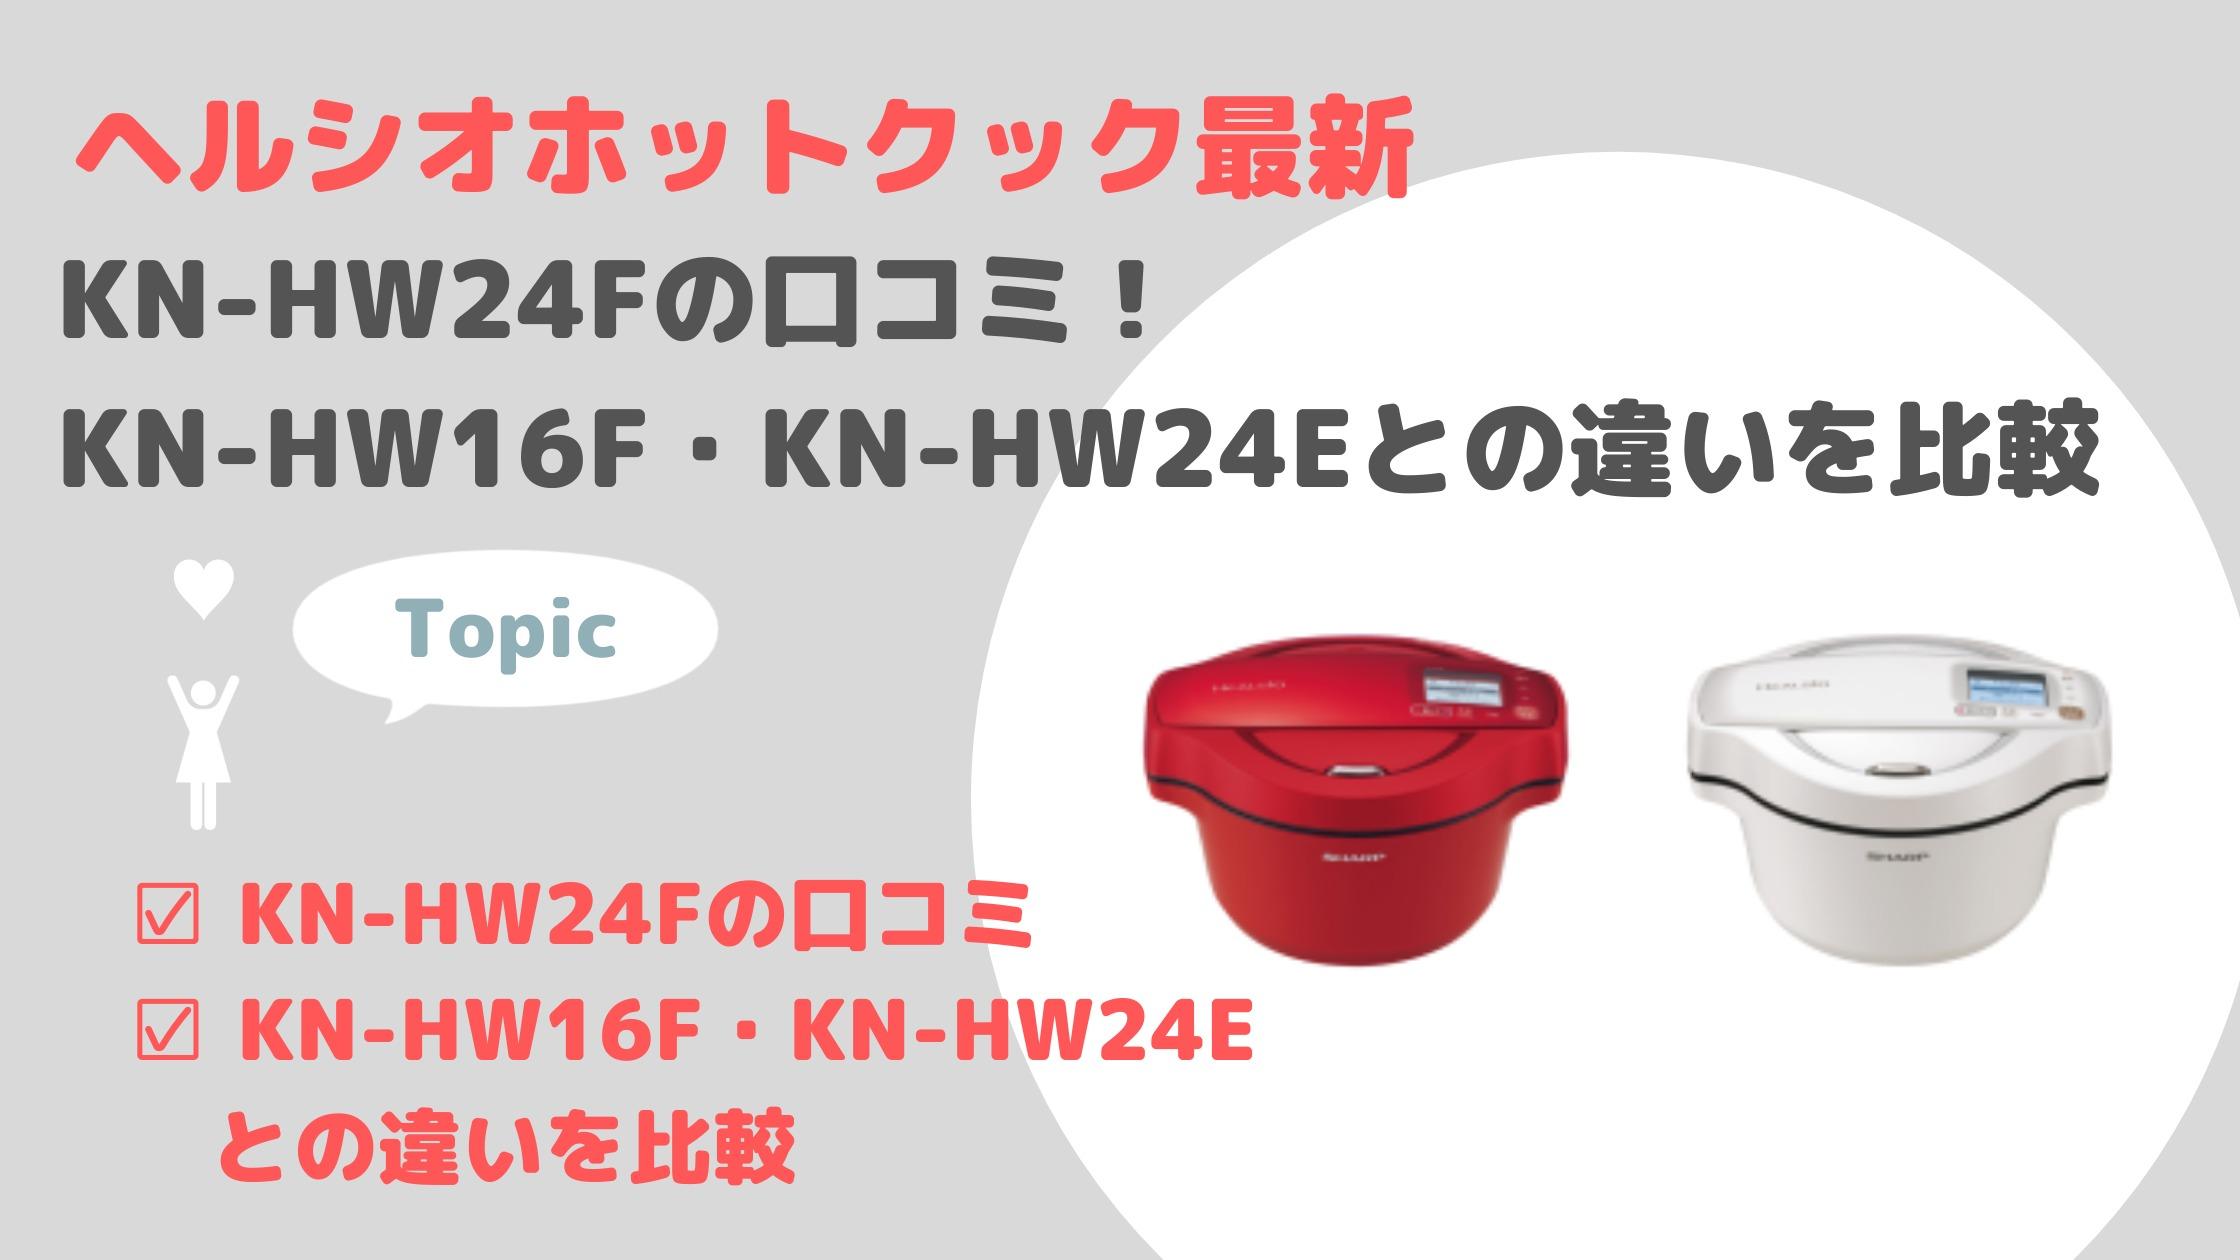 KN-HW24Fの口コミ!KN-HW16F・KN-HW24Eとの違いを比較